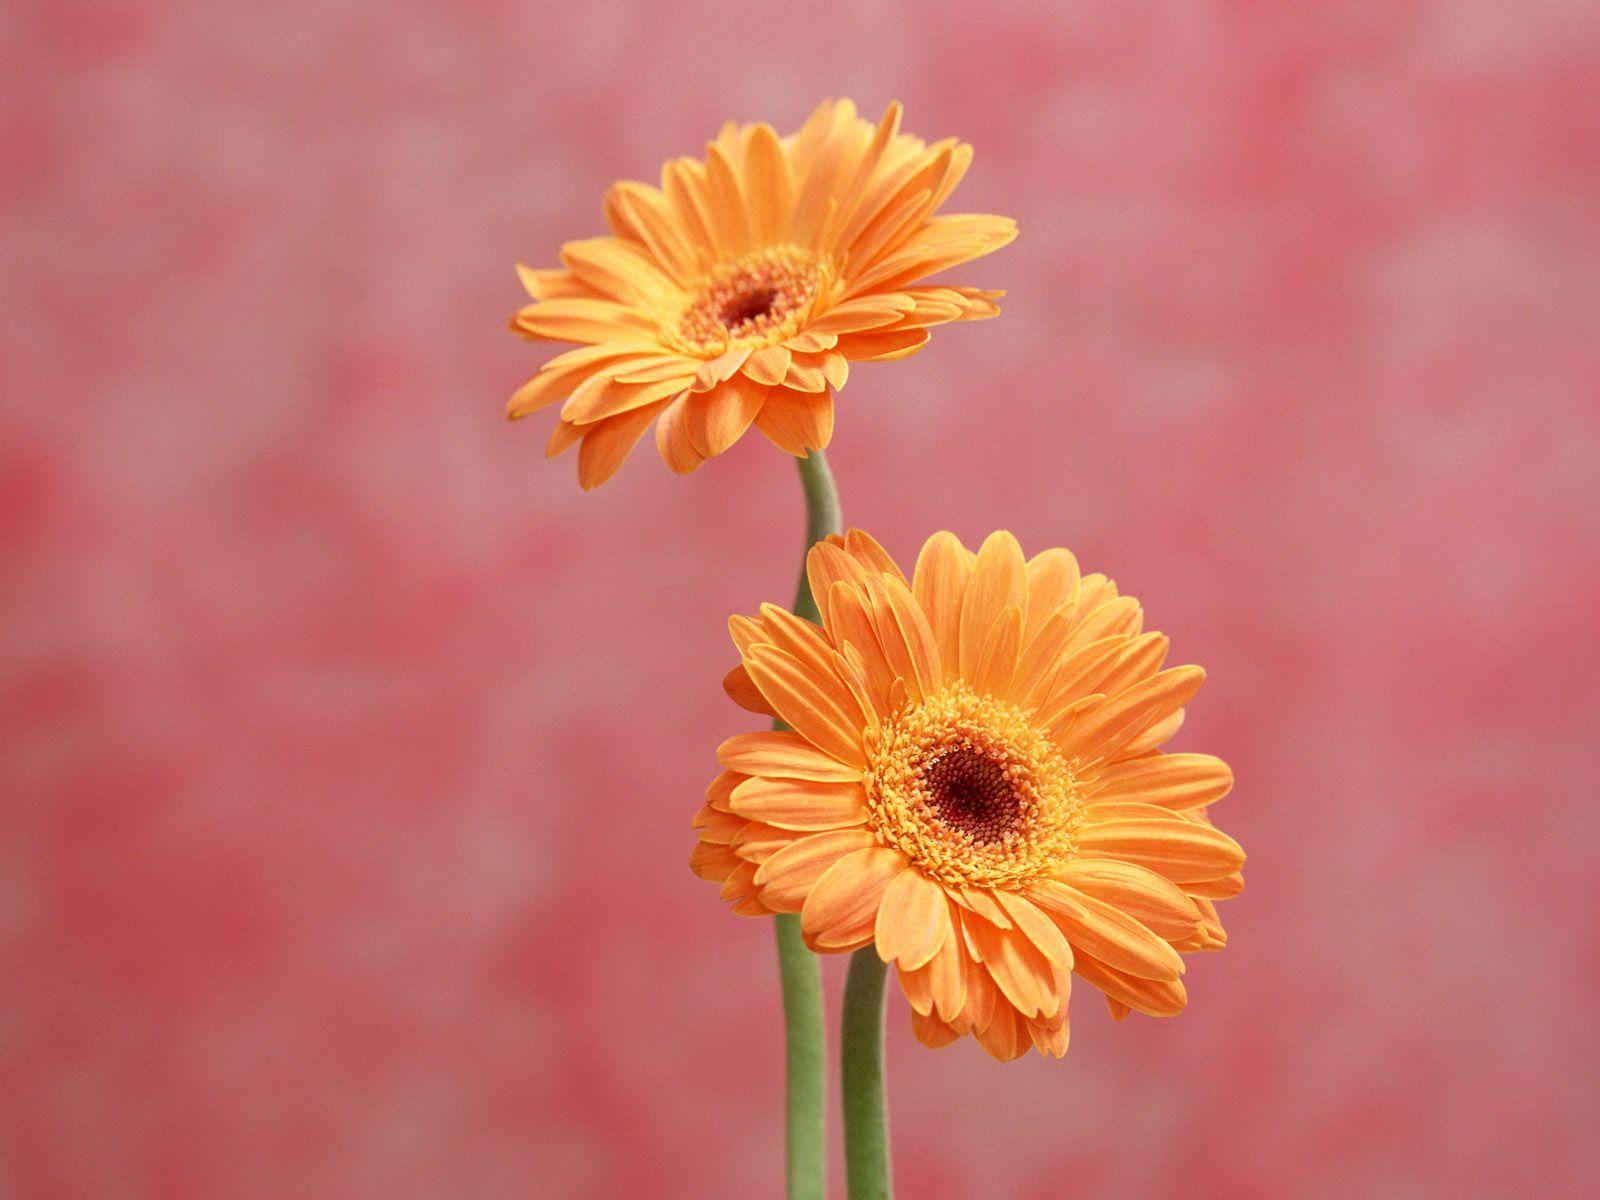 Gerbera Daisy Orange Flower Wallpaper gerbera daisy orange